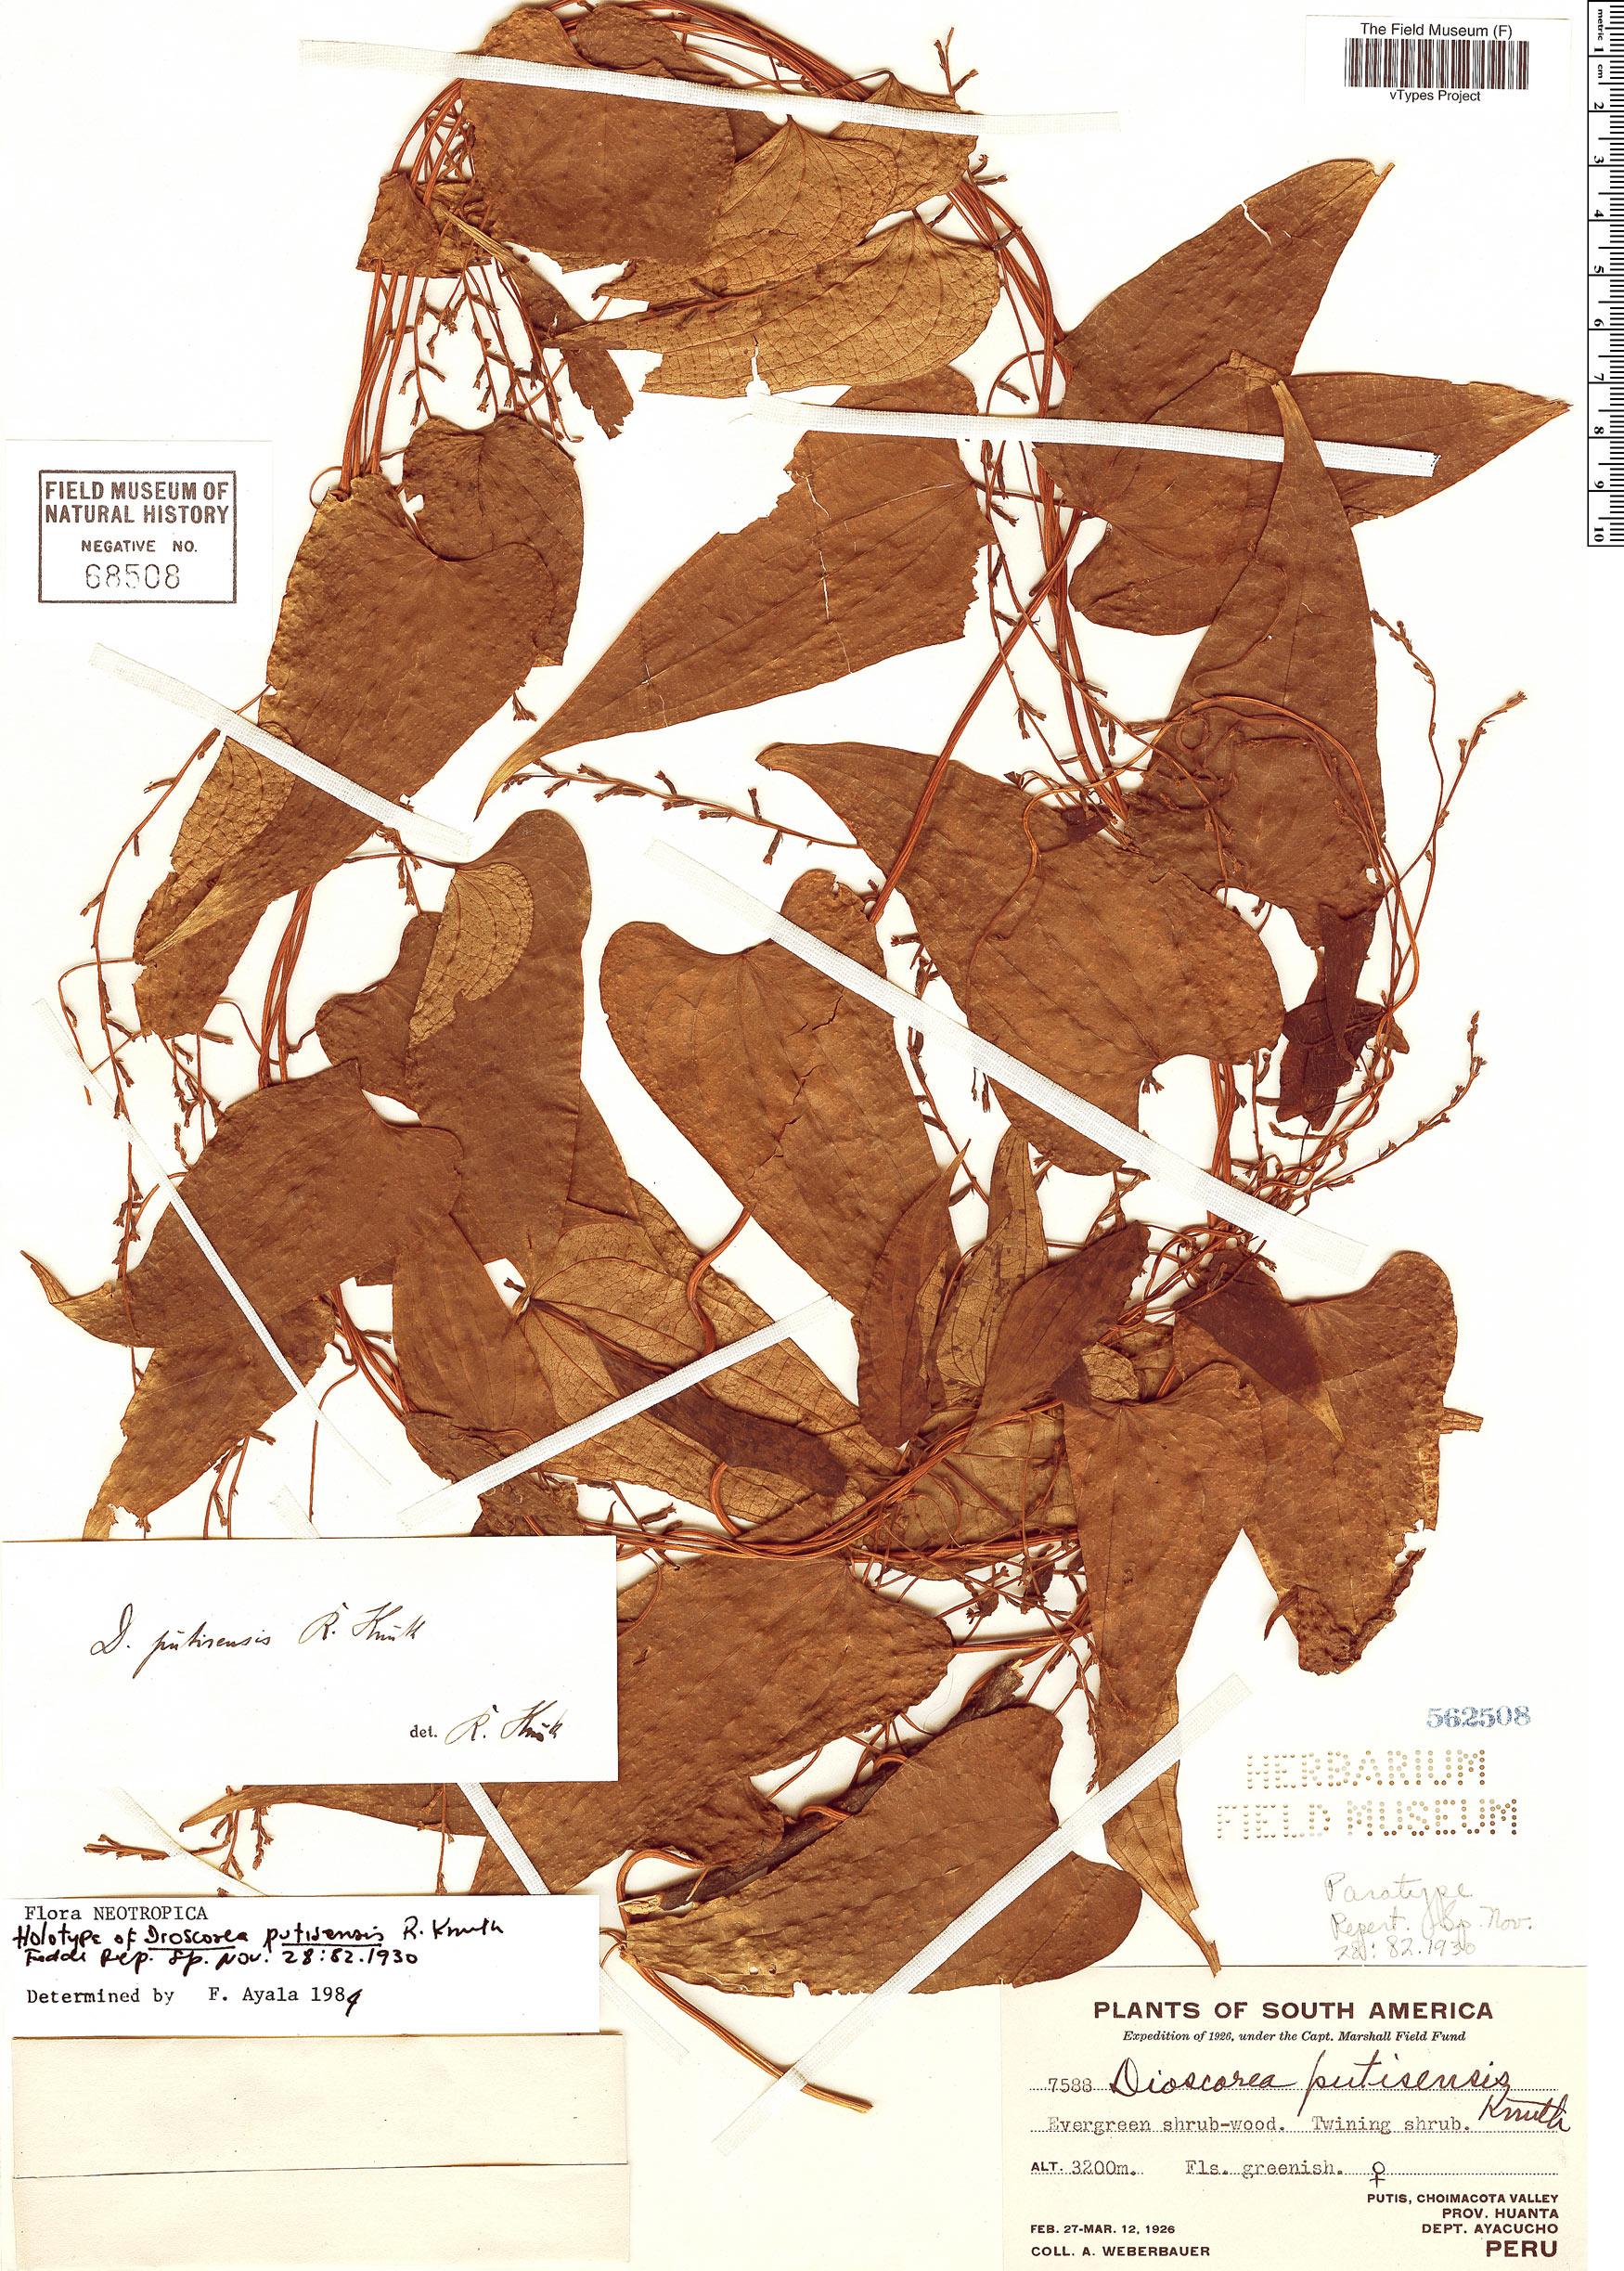 Espécimen: Dioscorea putisensis